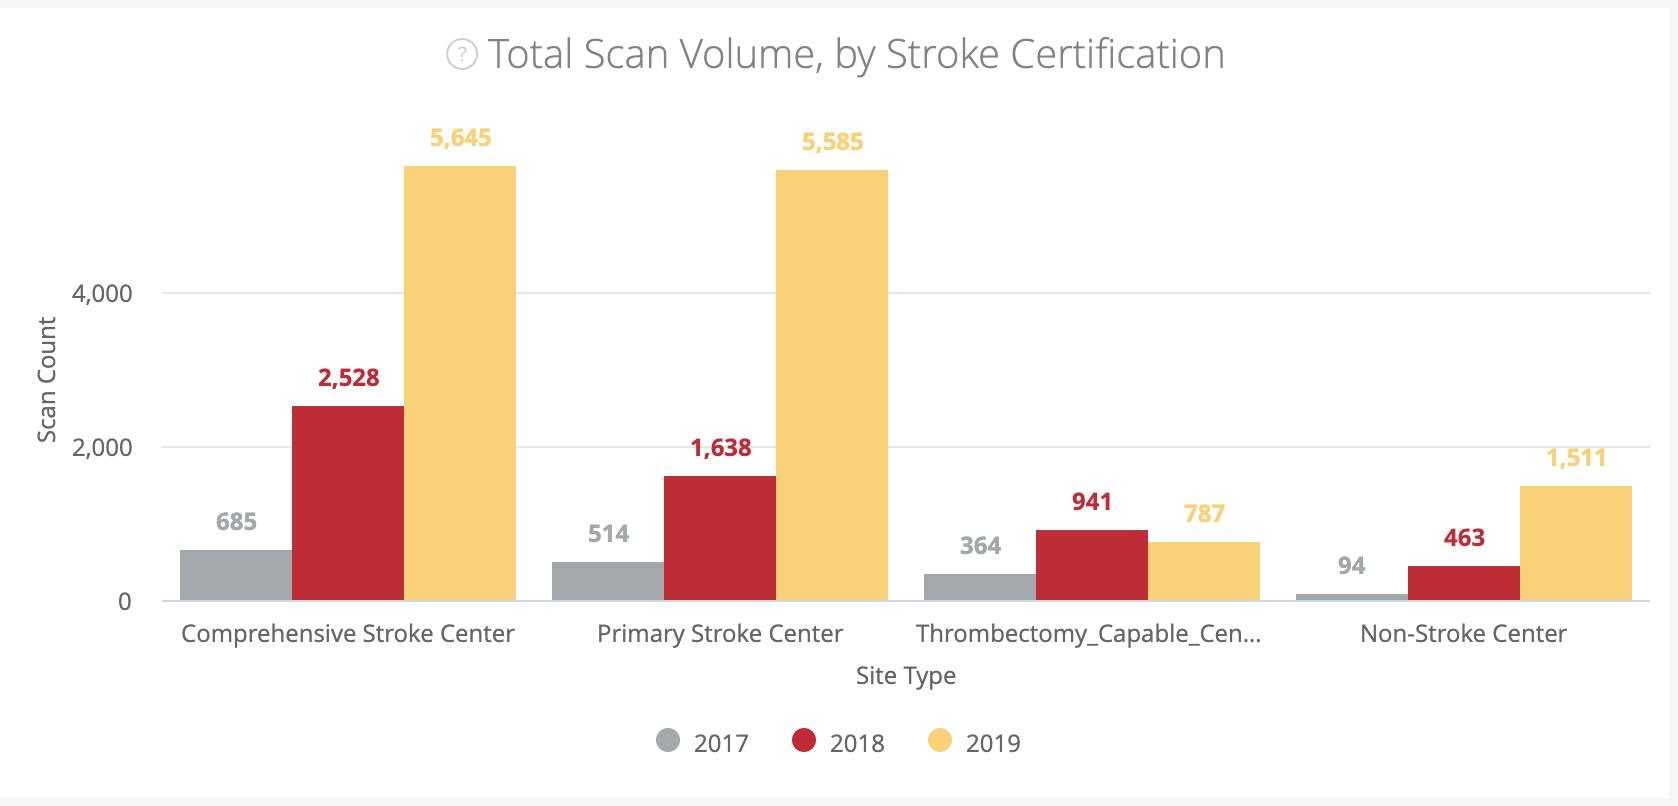 Total scan volume by stroke certification